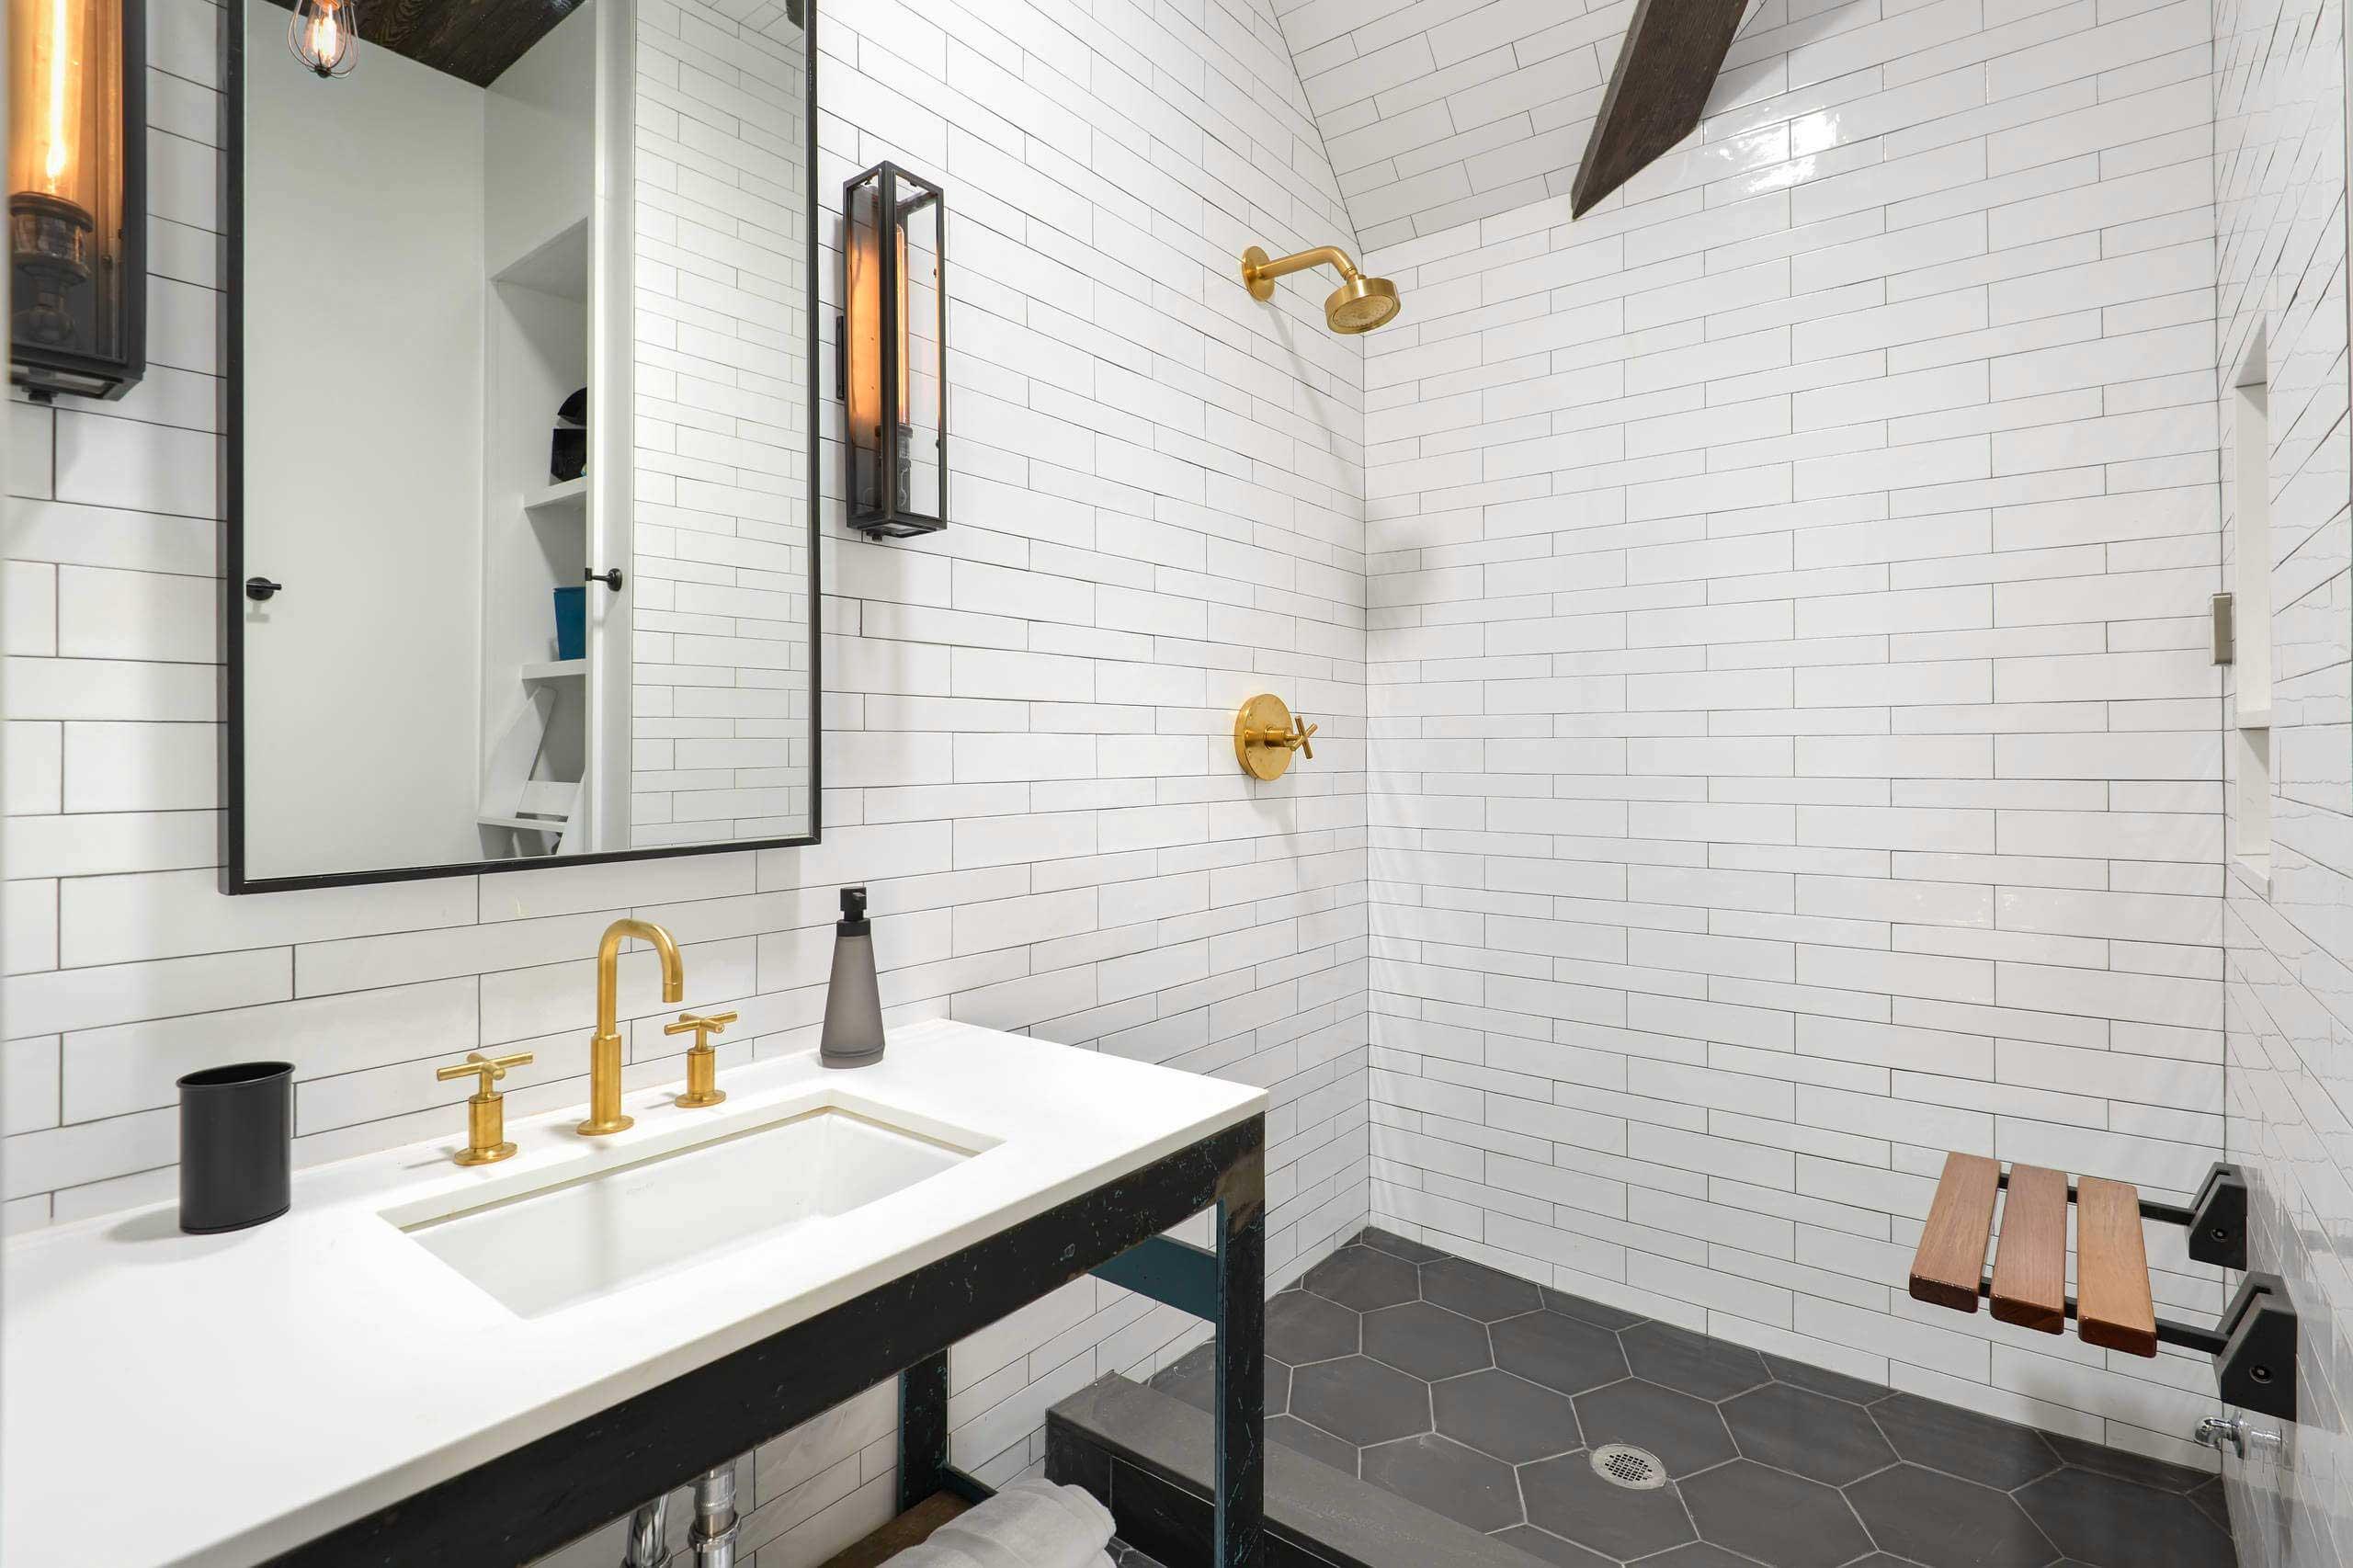 Salle de bains avec carrelage blanc - Acheter carrelage salle de bain ...